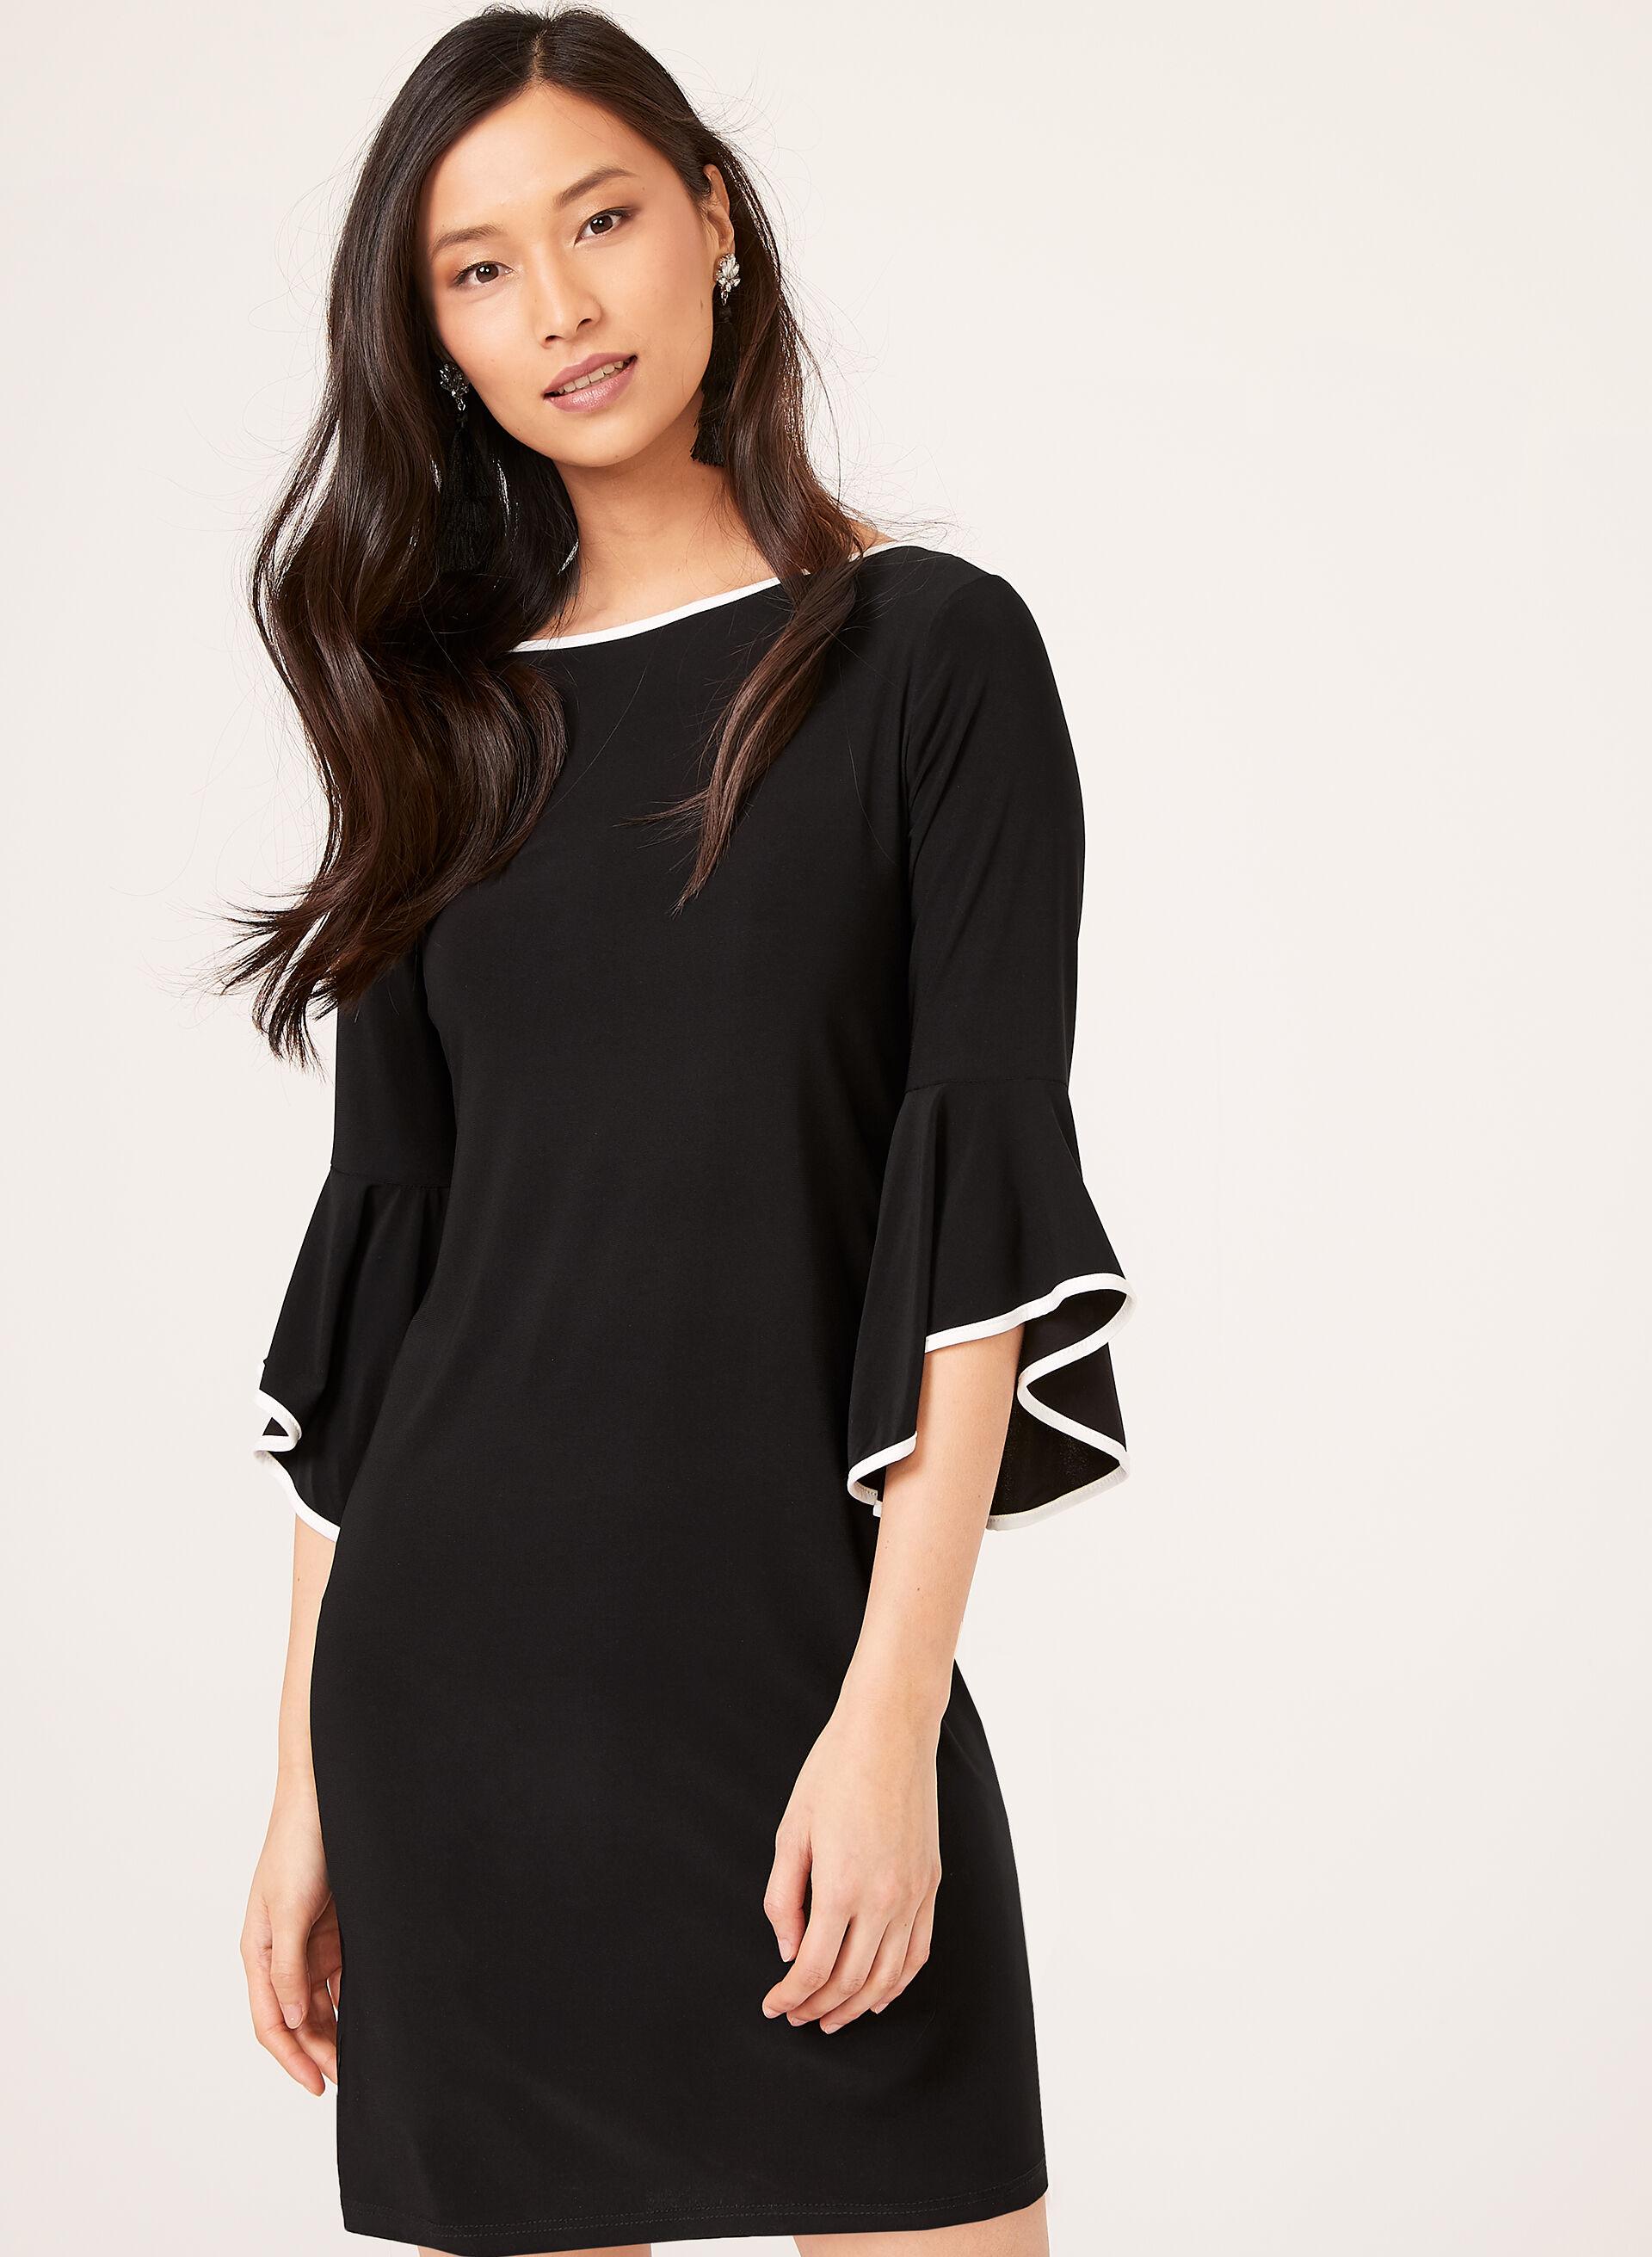 Robe noire petite taille